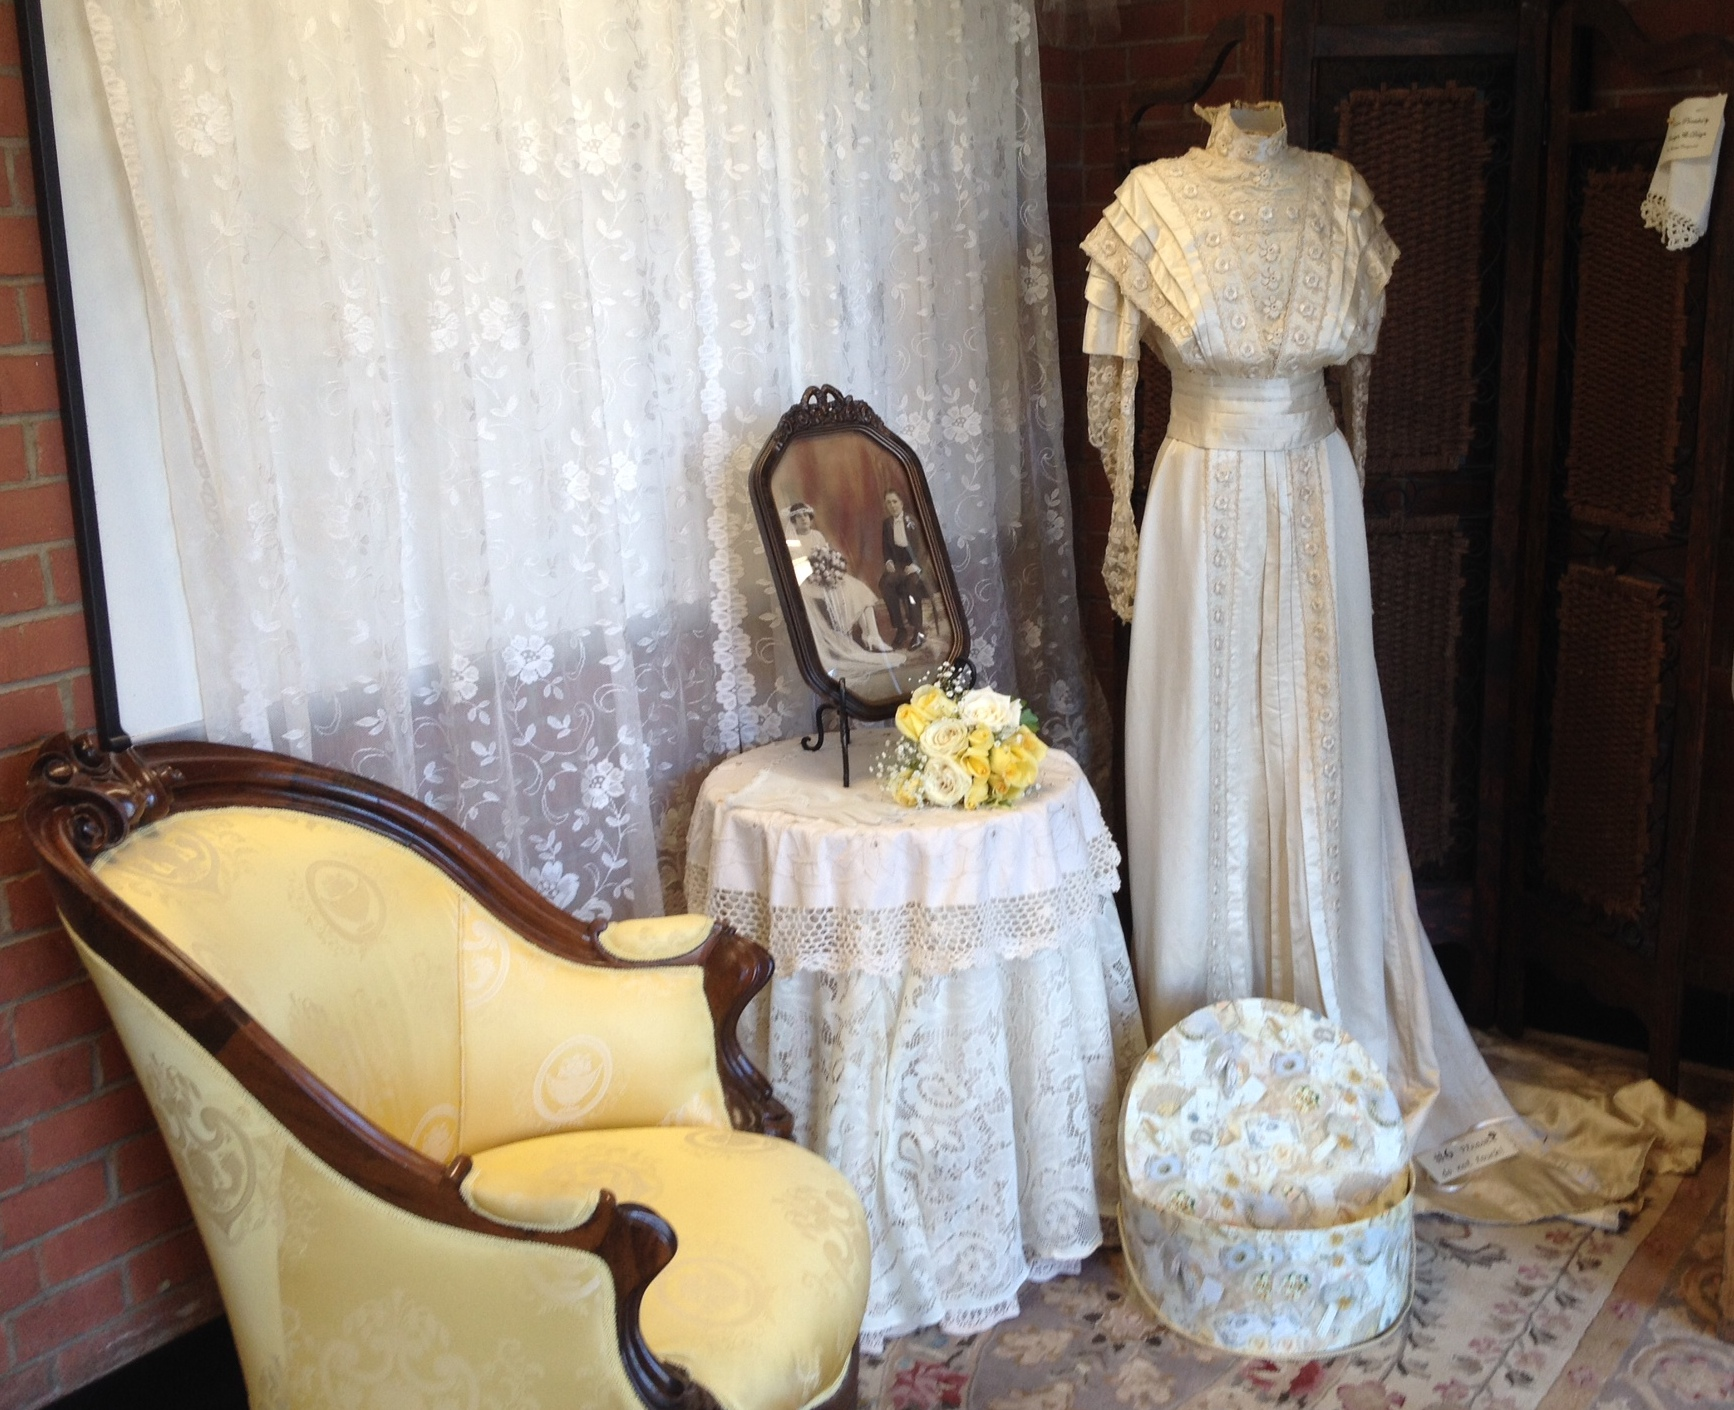 9arrangement and wedding gown5 cr.jpg